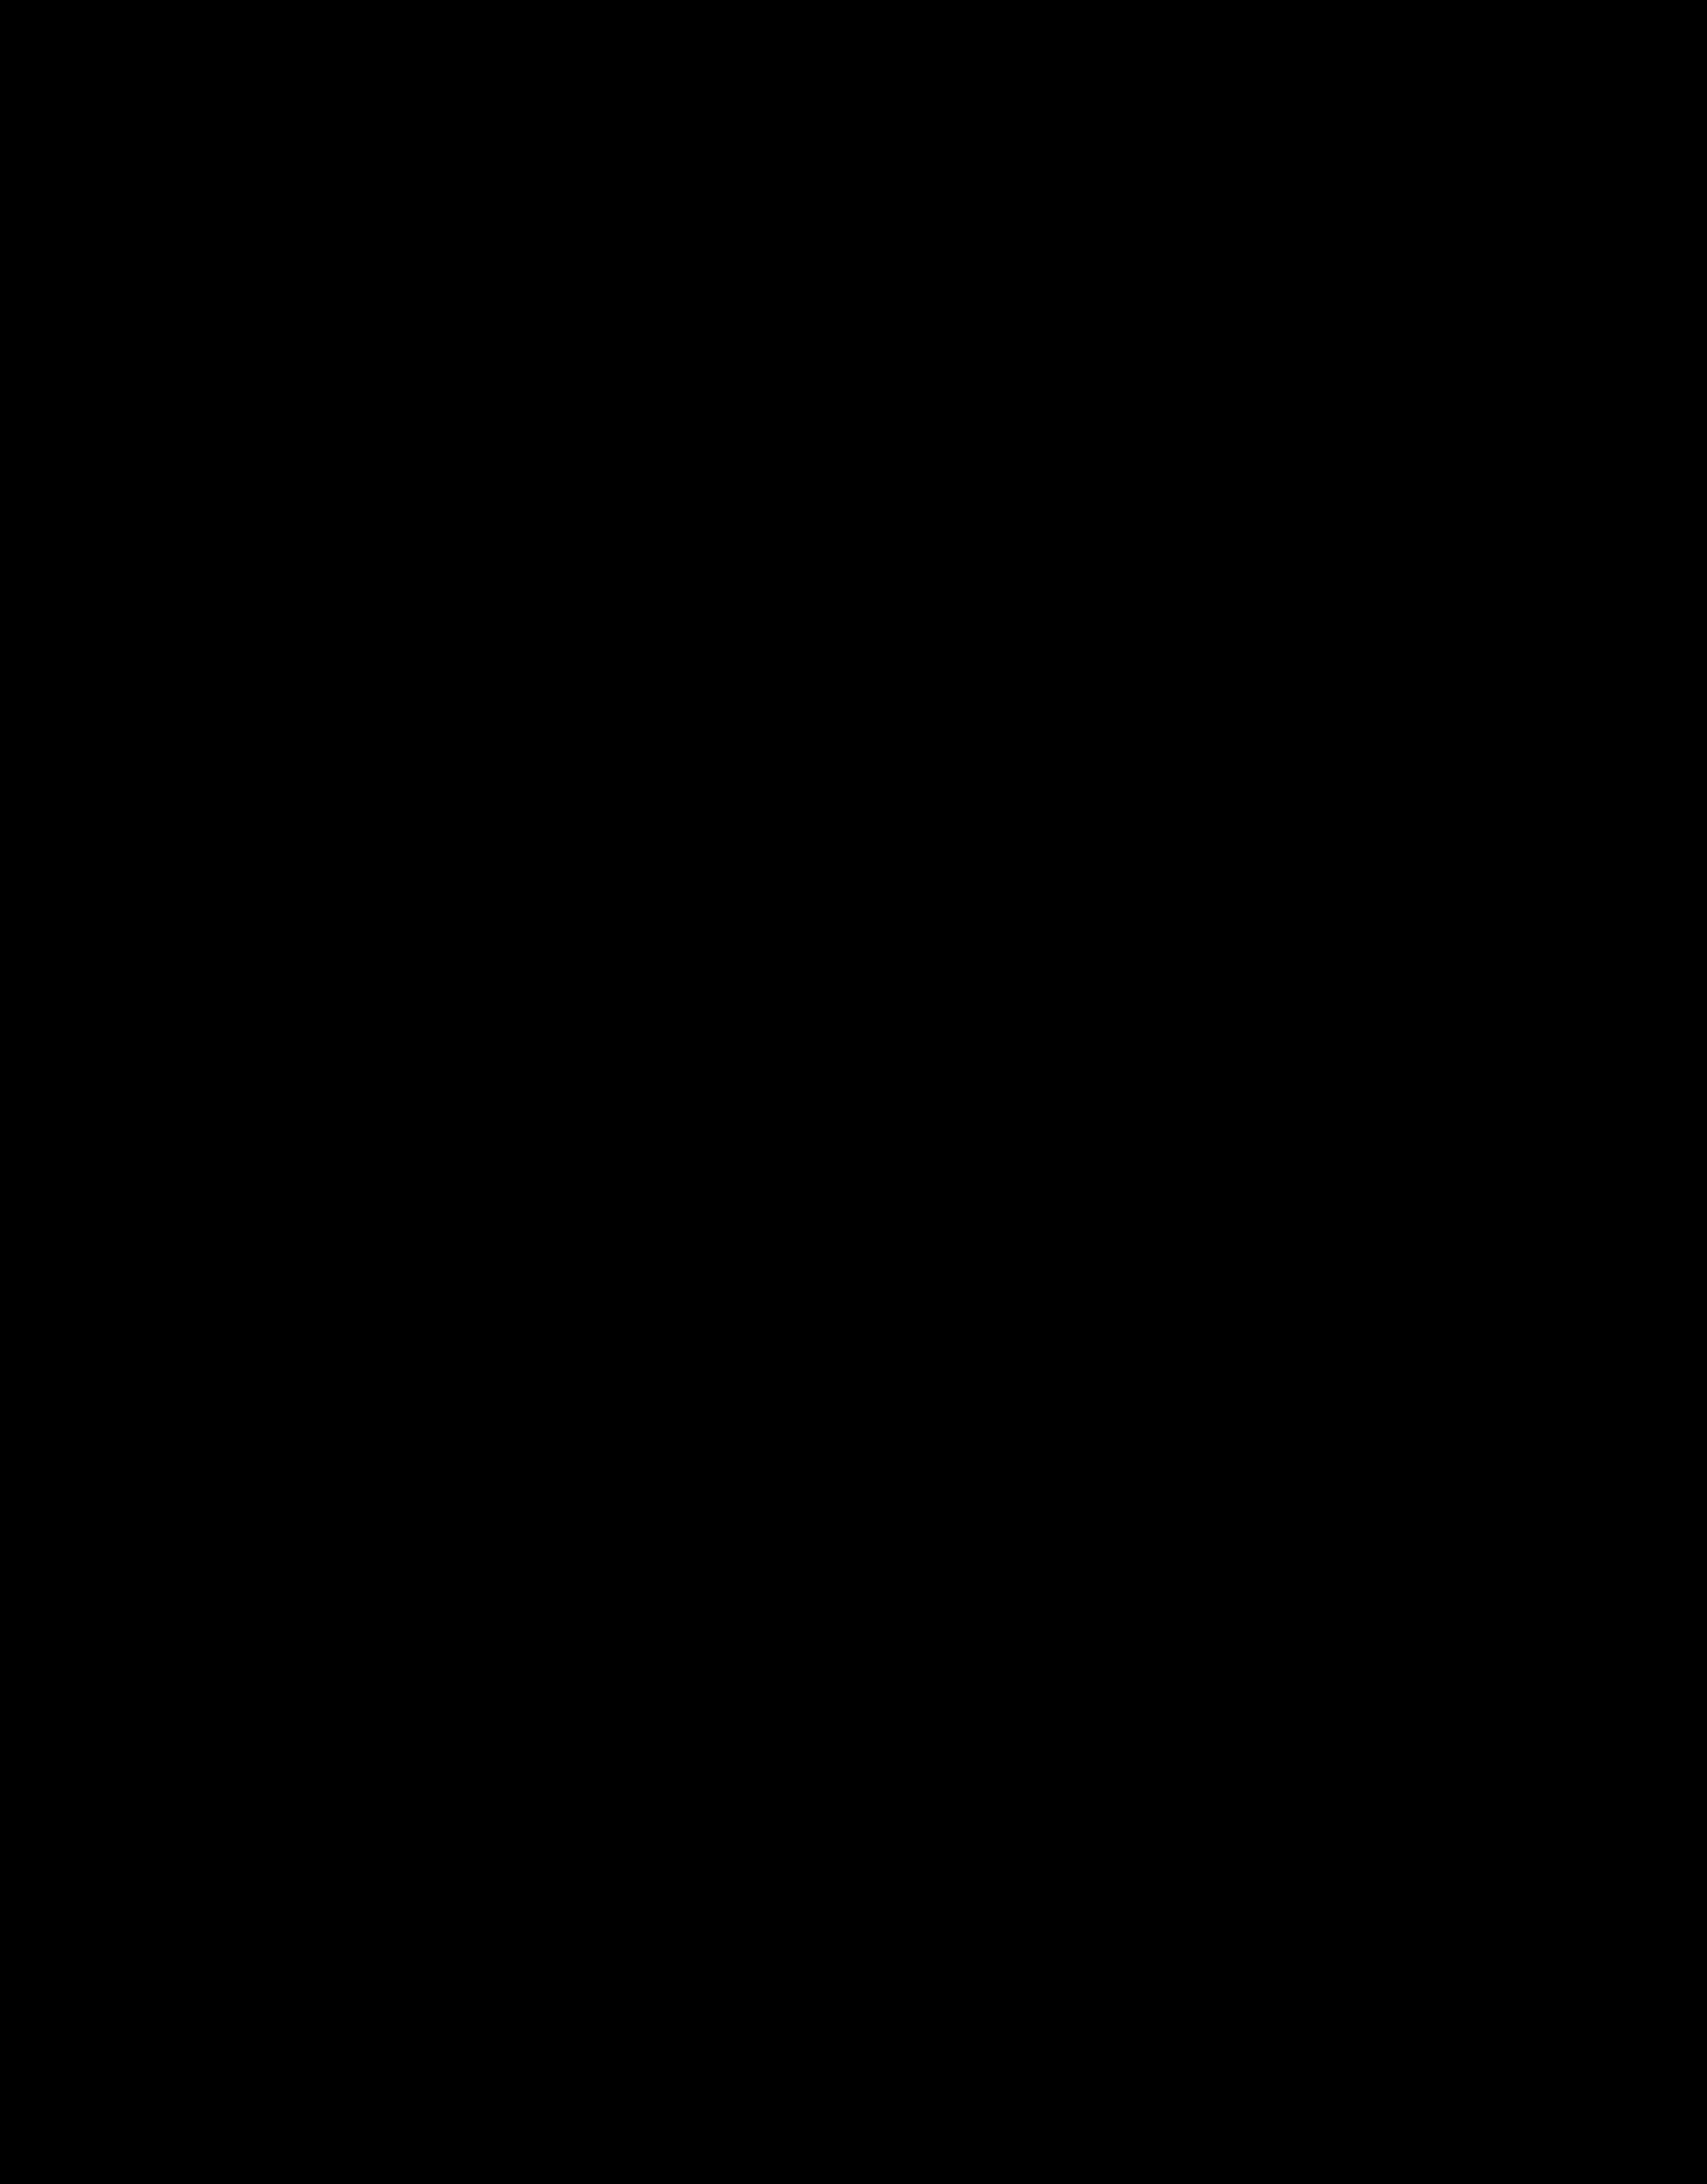 Clipart - William Gladstone - 166.5KB